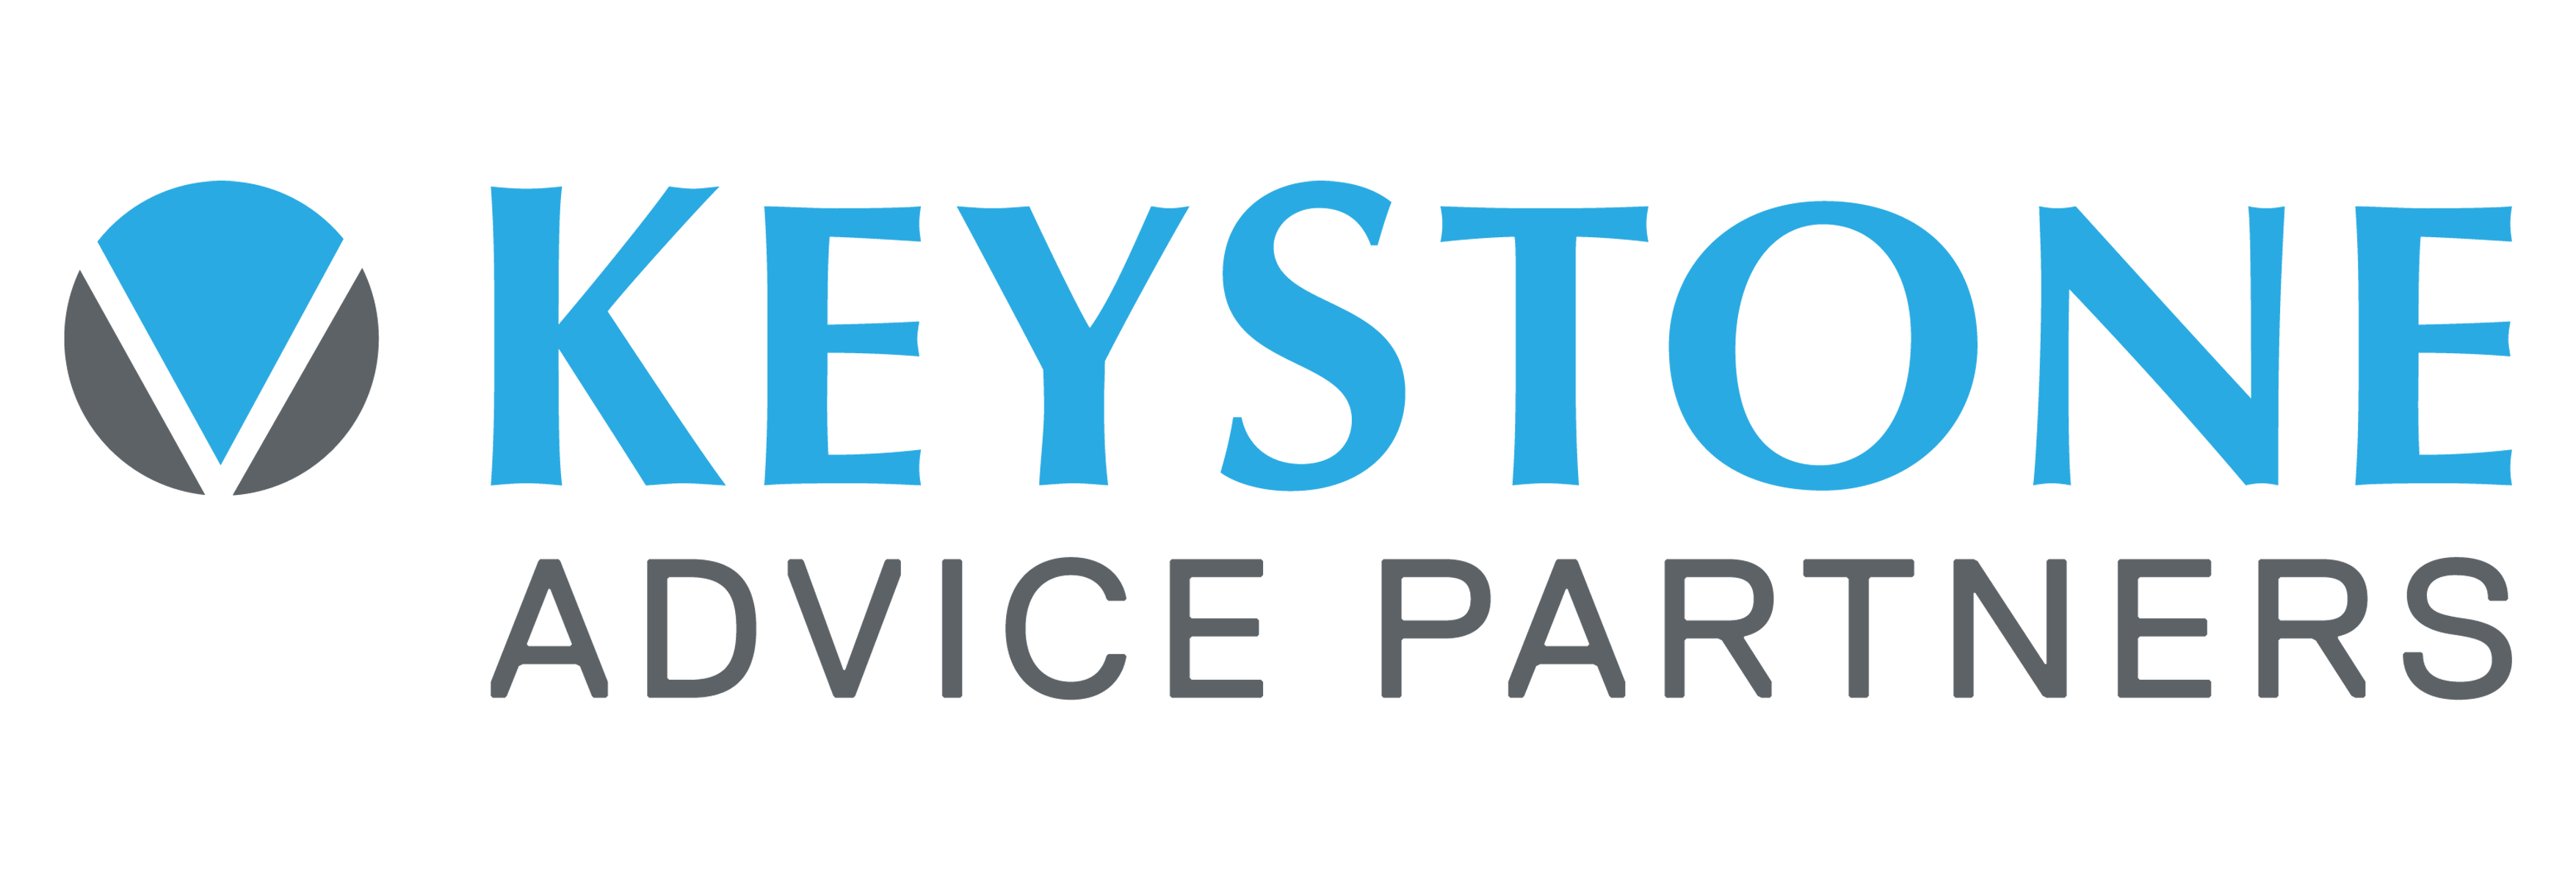 Keystone Advice Partners